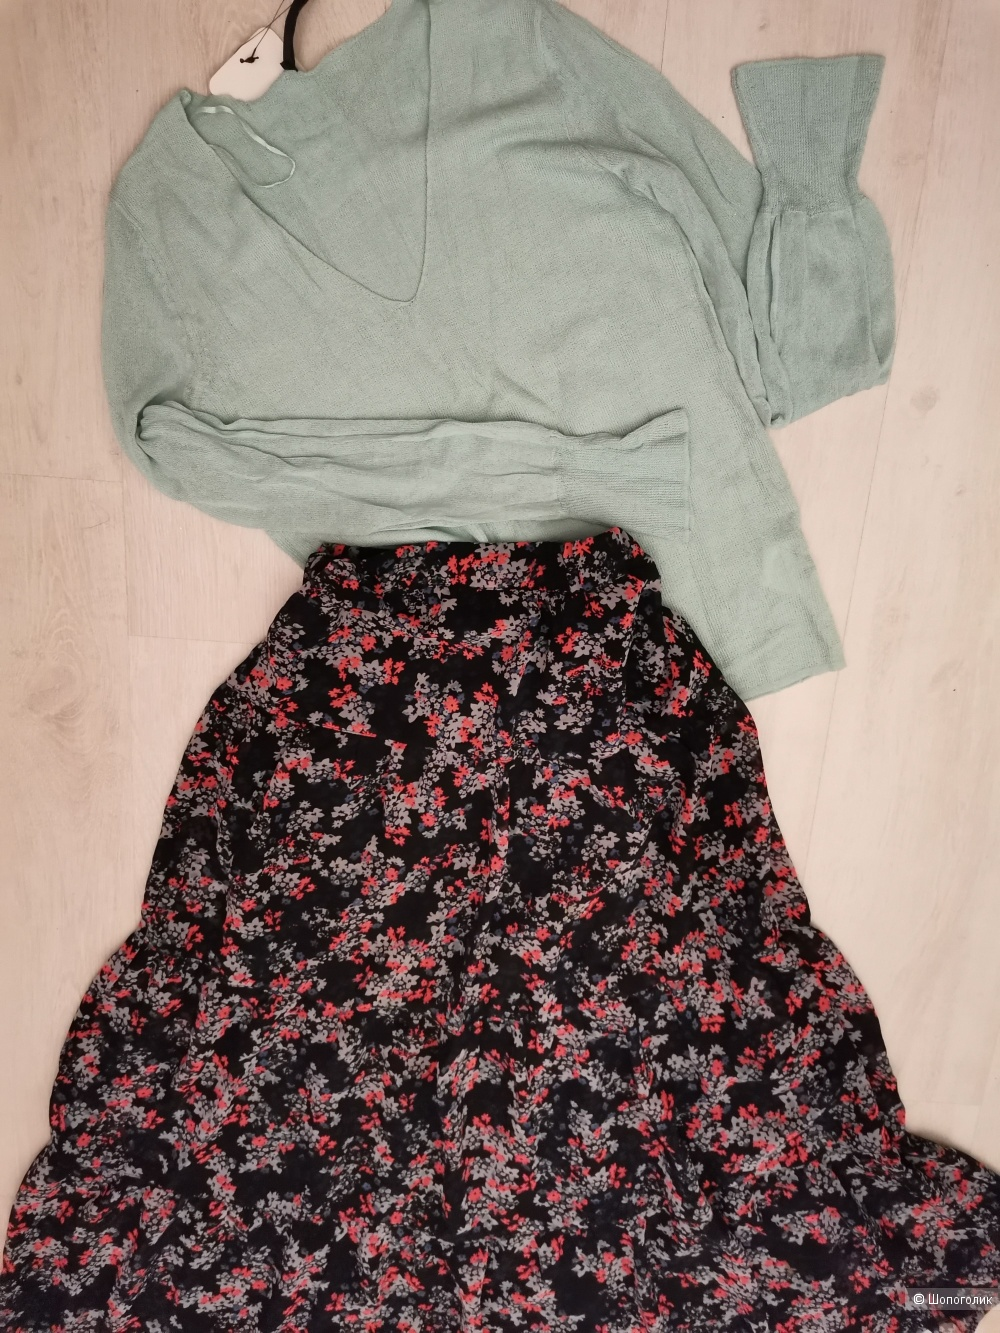 Сет: юбка макси Only, джемпер Concept Club 42